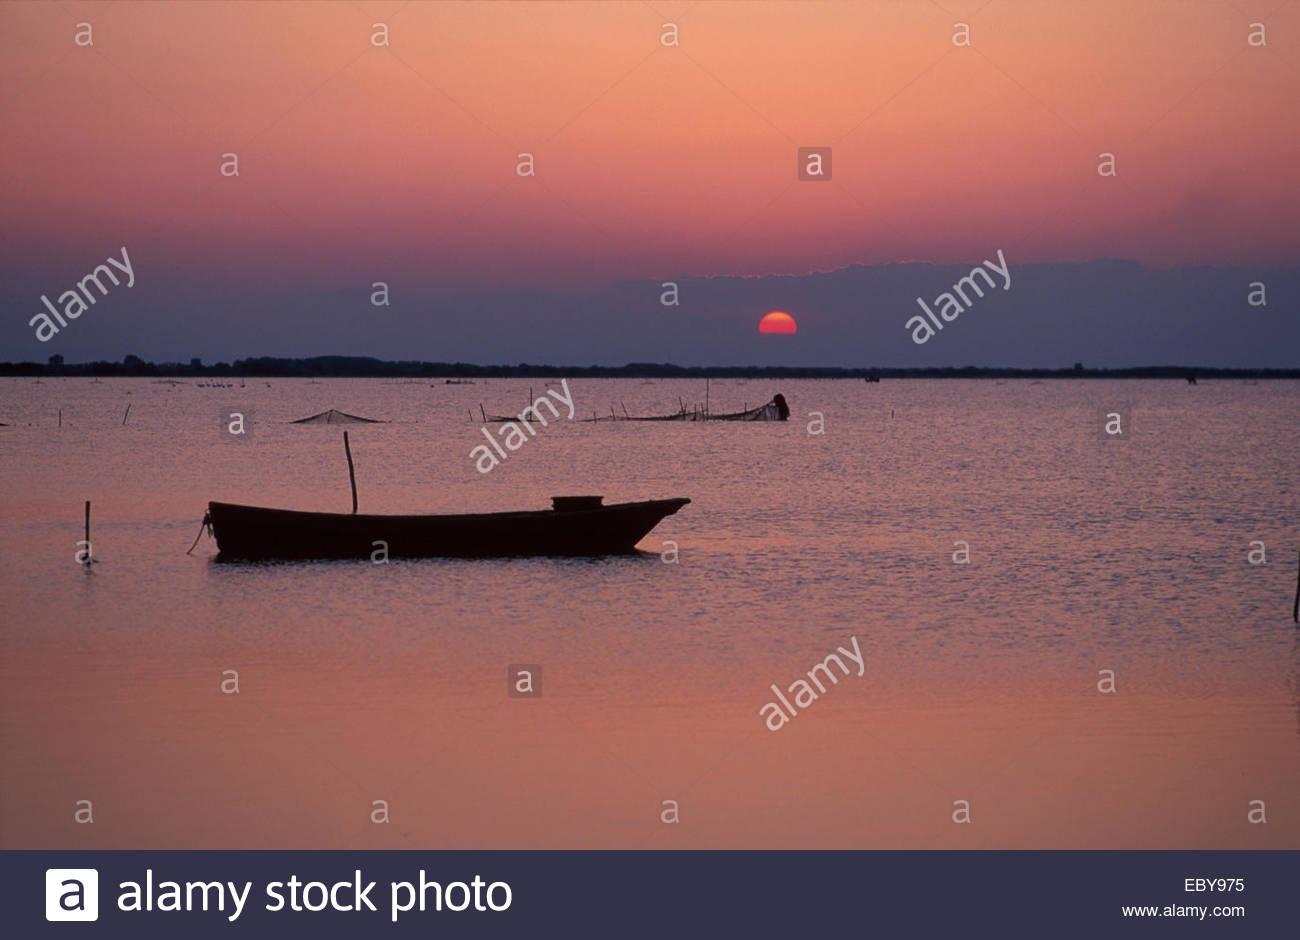 Camargue at sunset - Stock Image